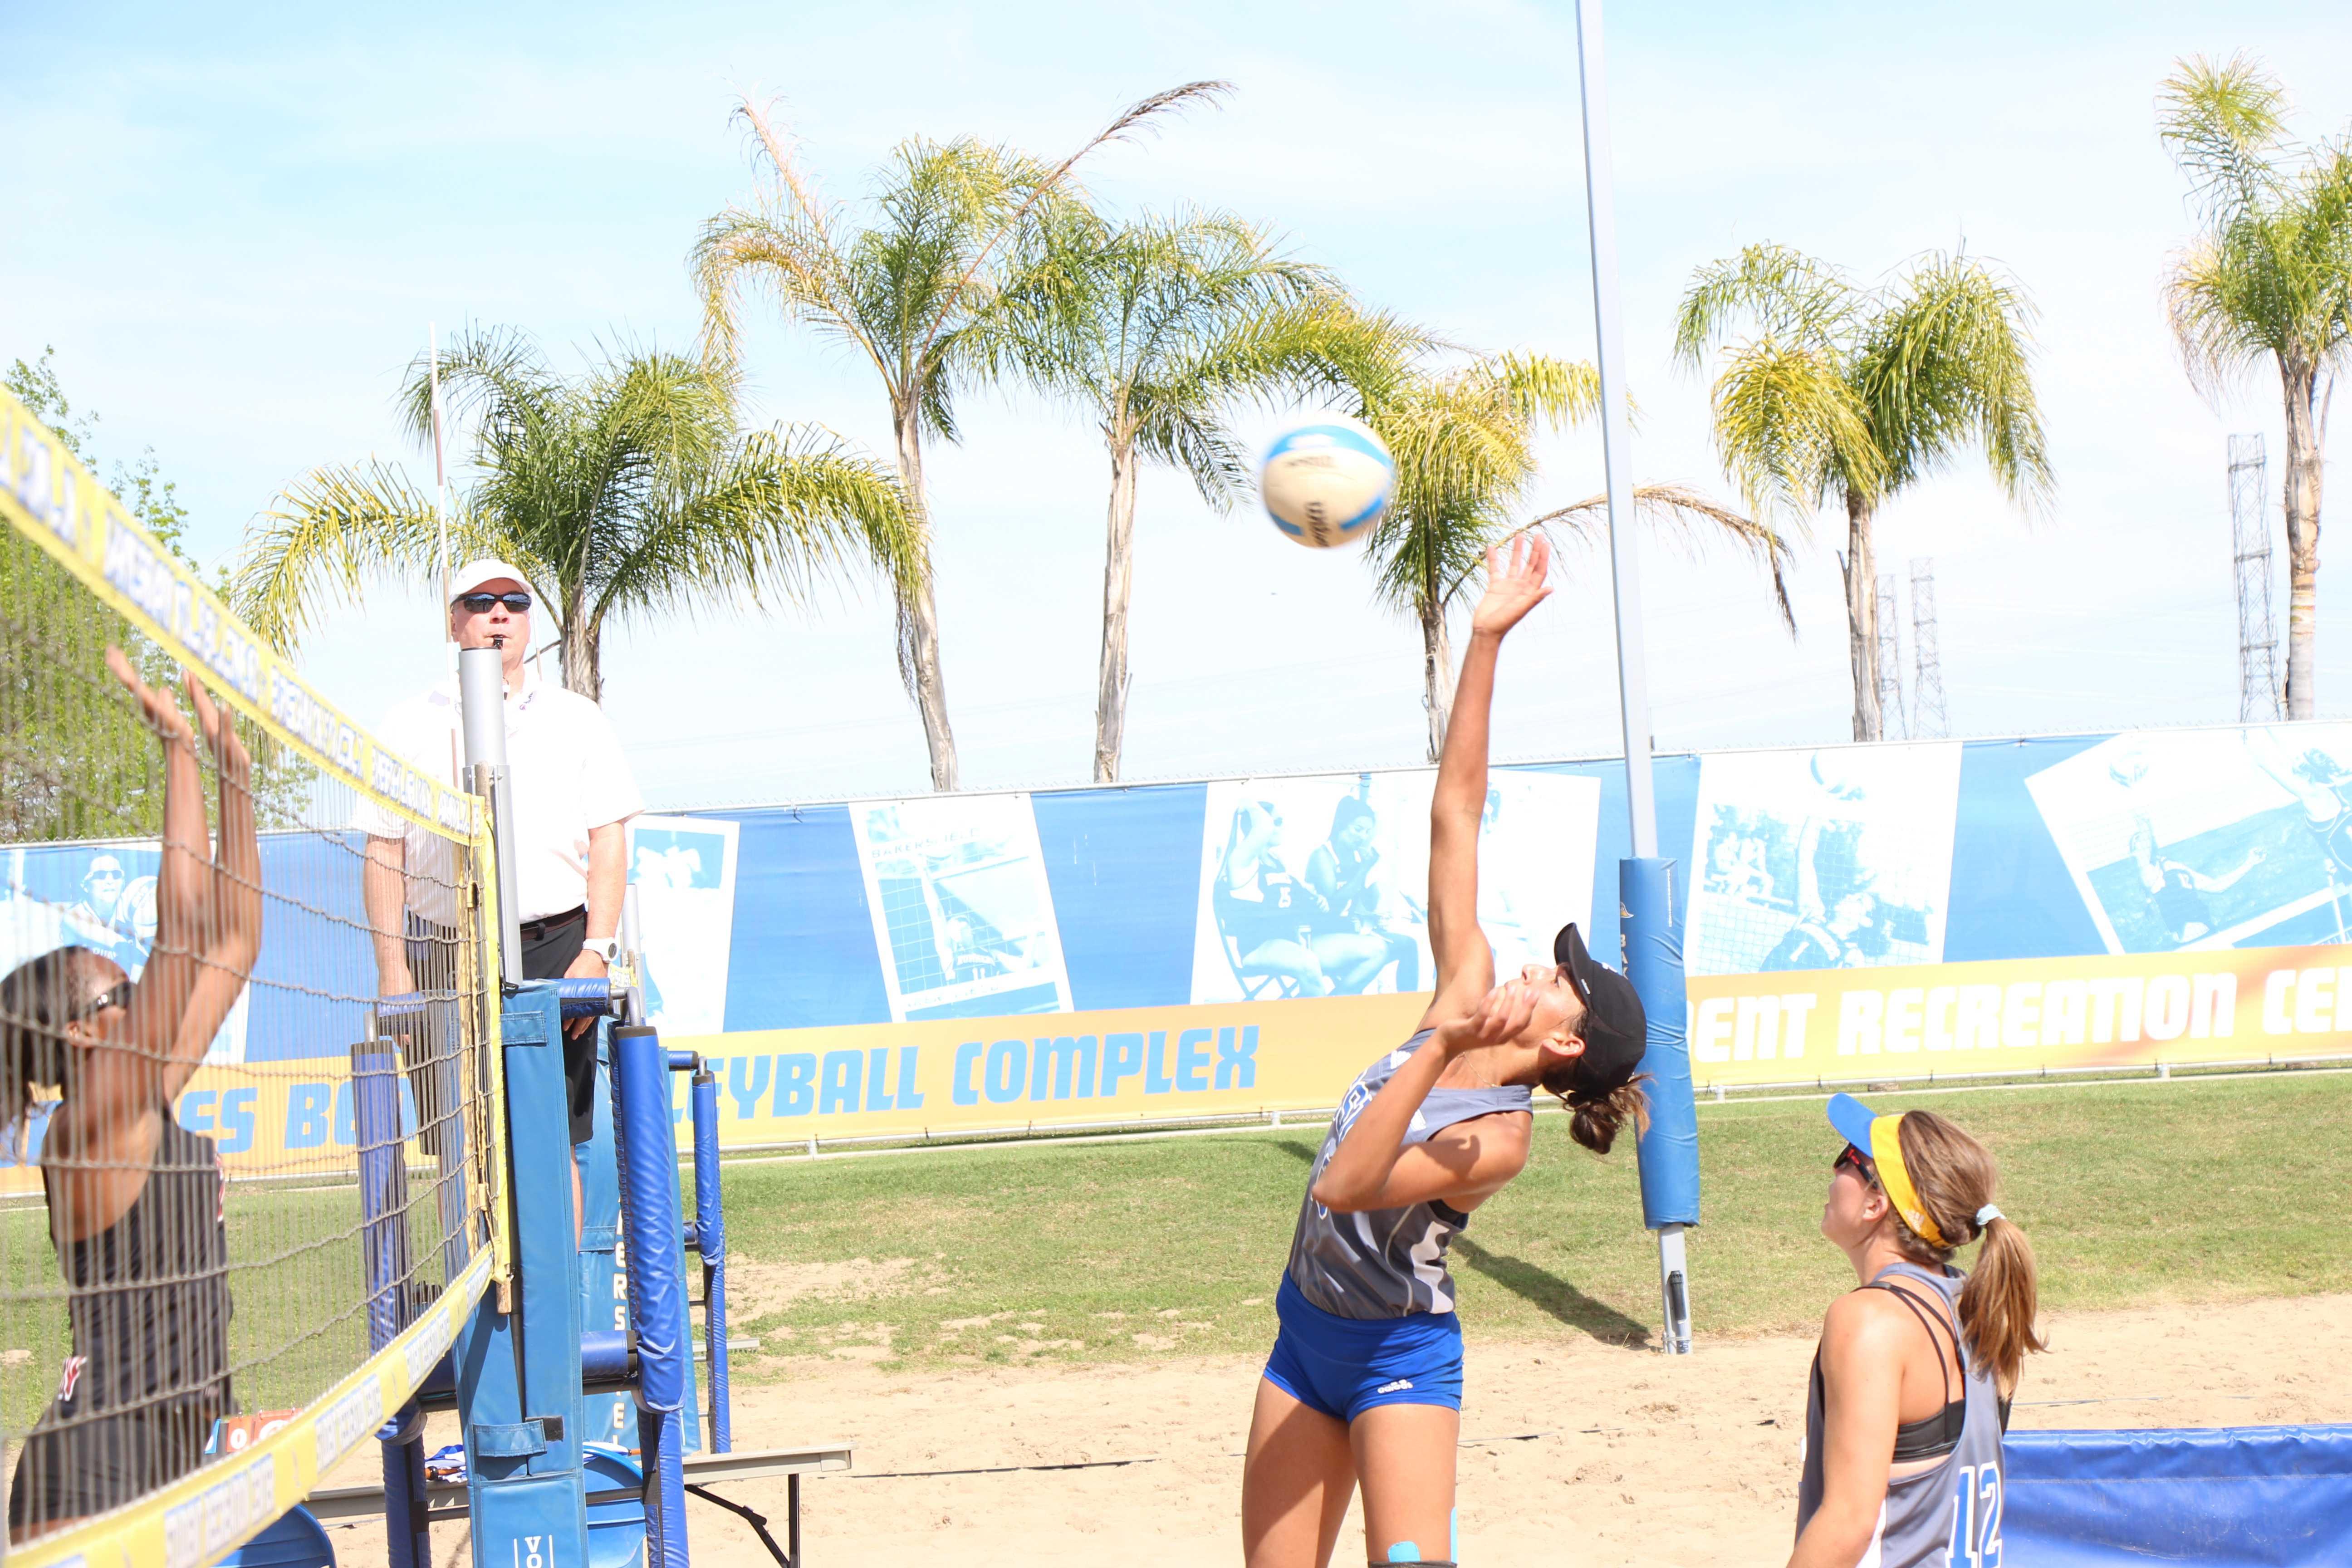 CSUB split double header, head to Hawaii for championships